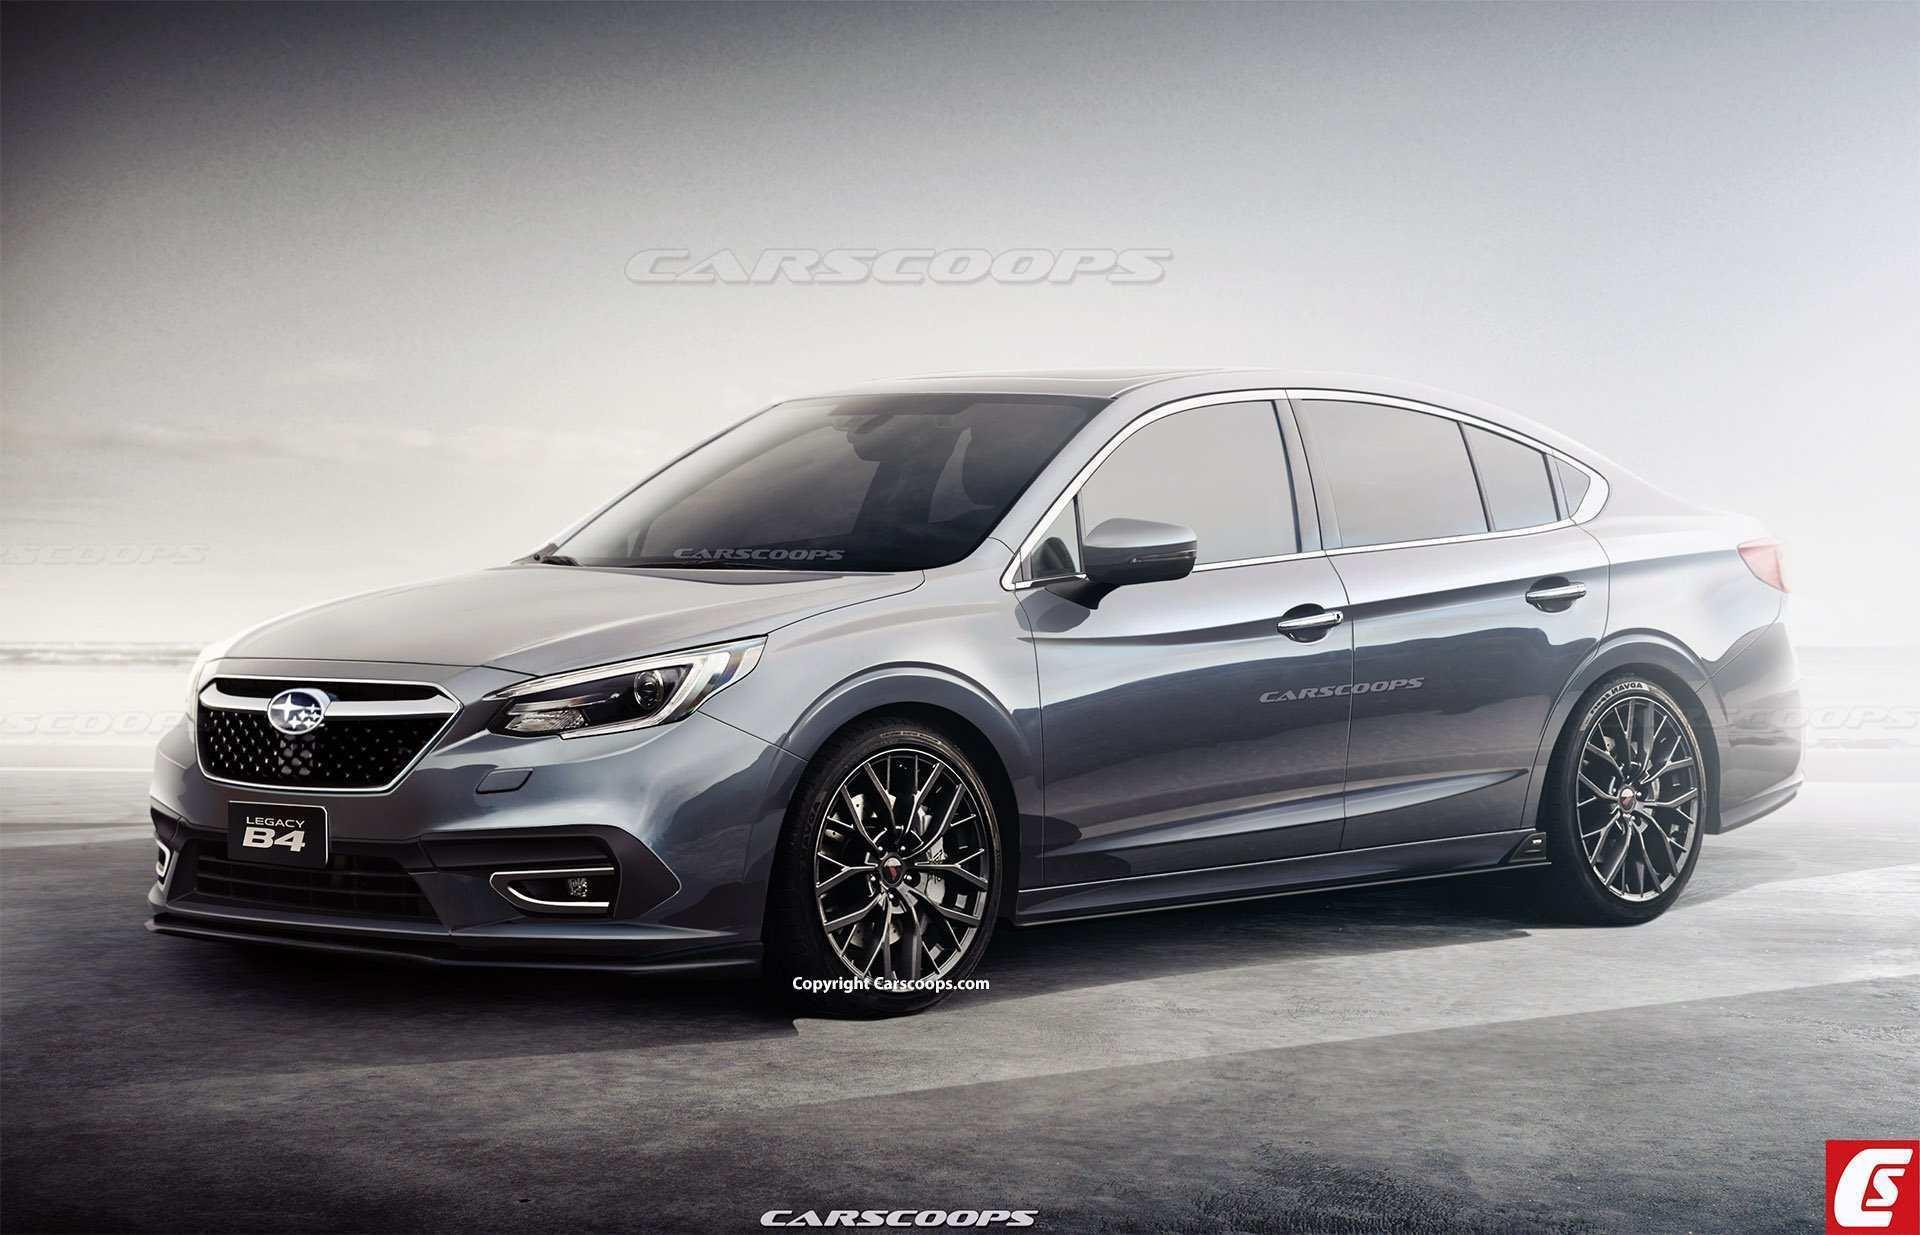 98 Great 2020 Subaru Impreza Review by 2020 Subaru Impreza